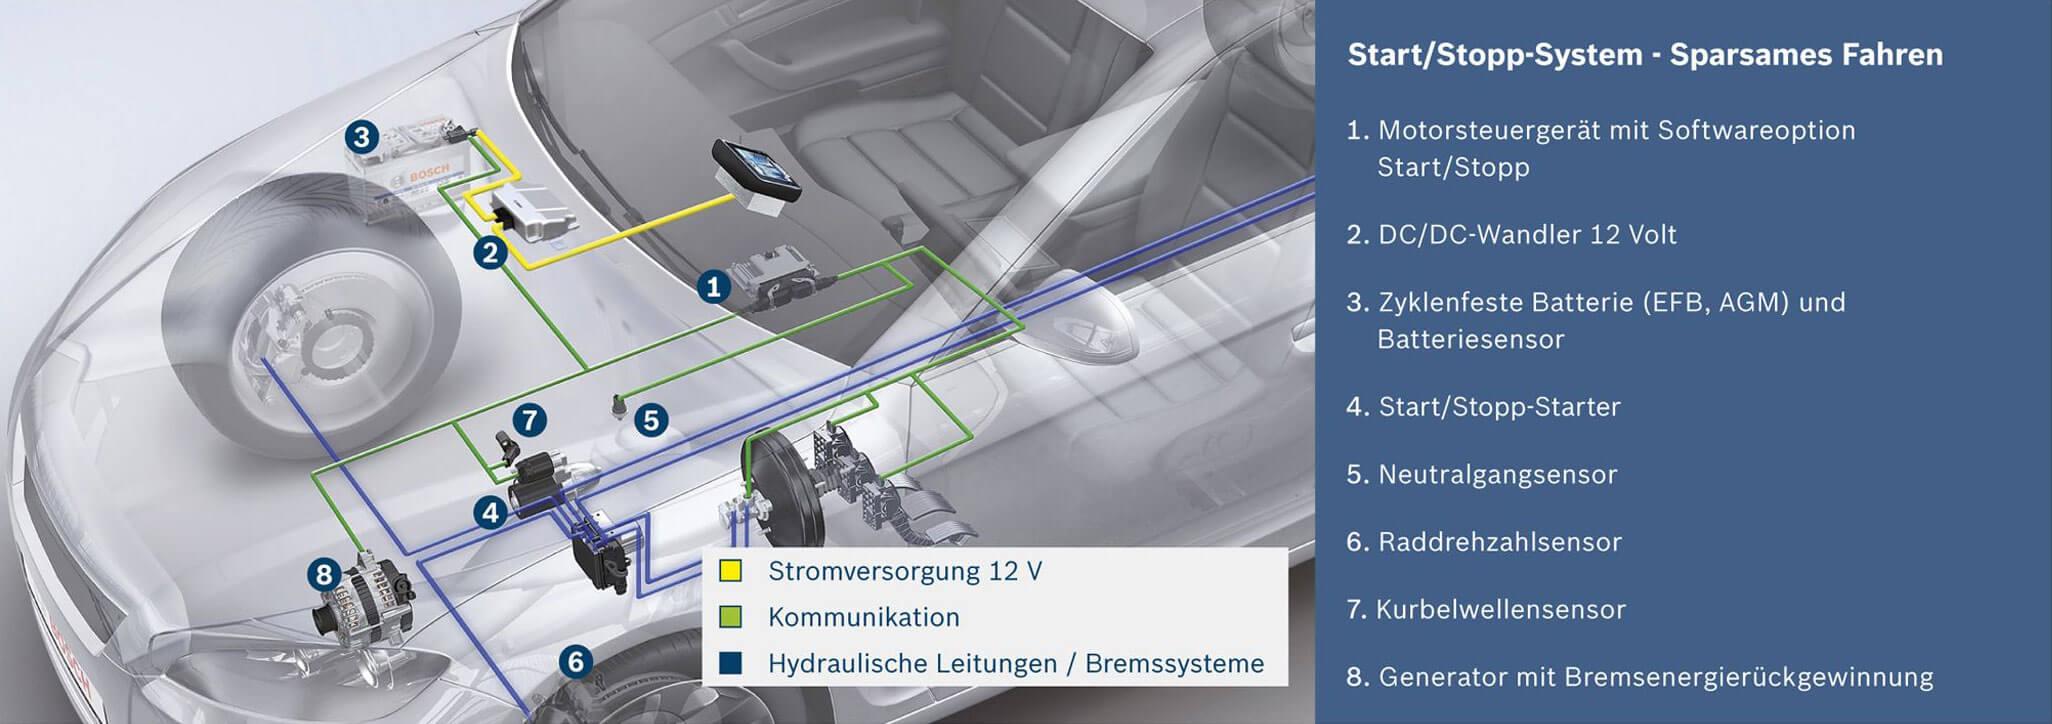 Start-Stopp-Automatik | mein-autolexikon.de